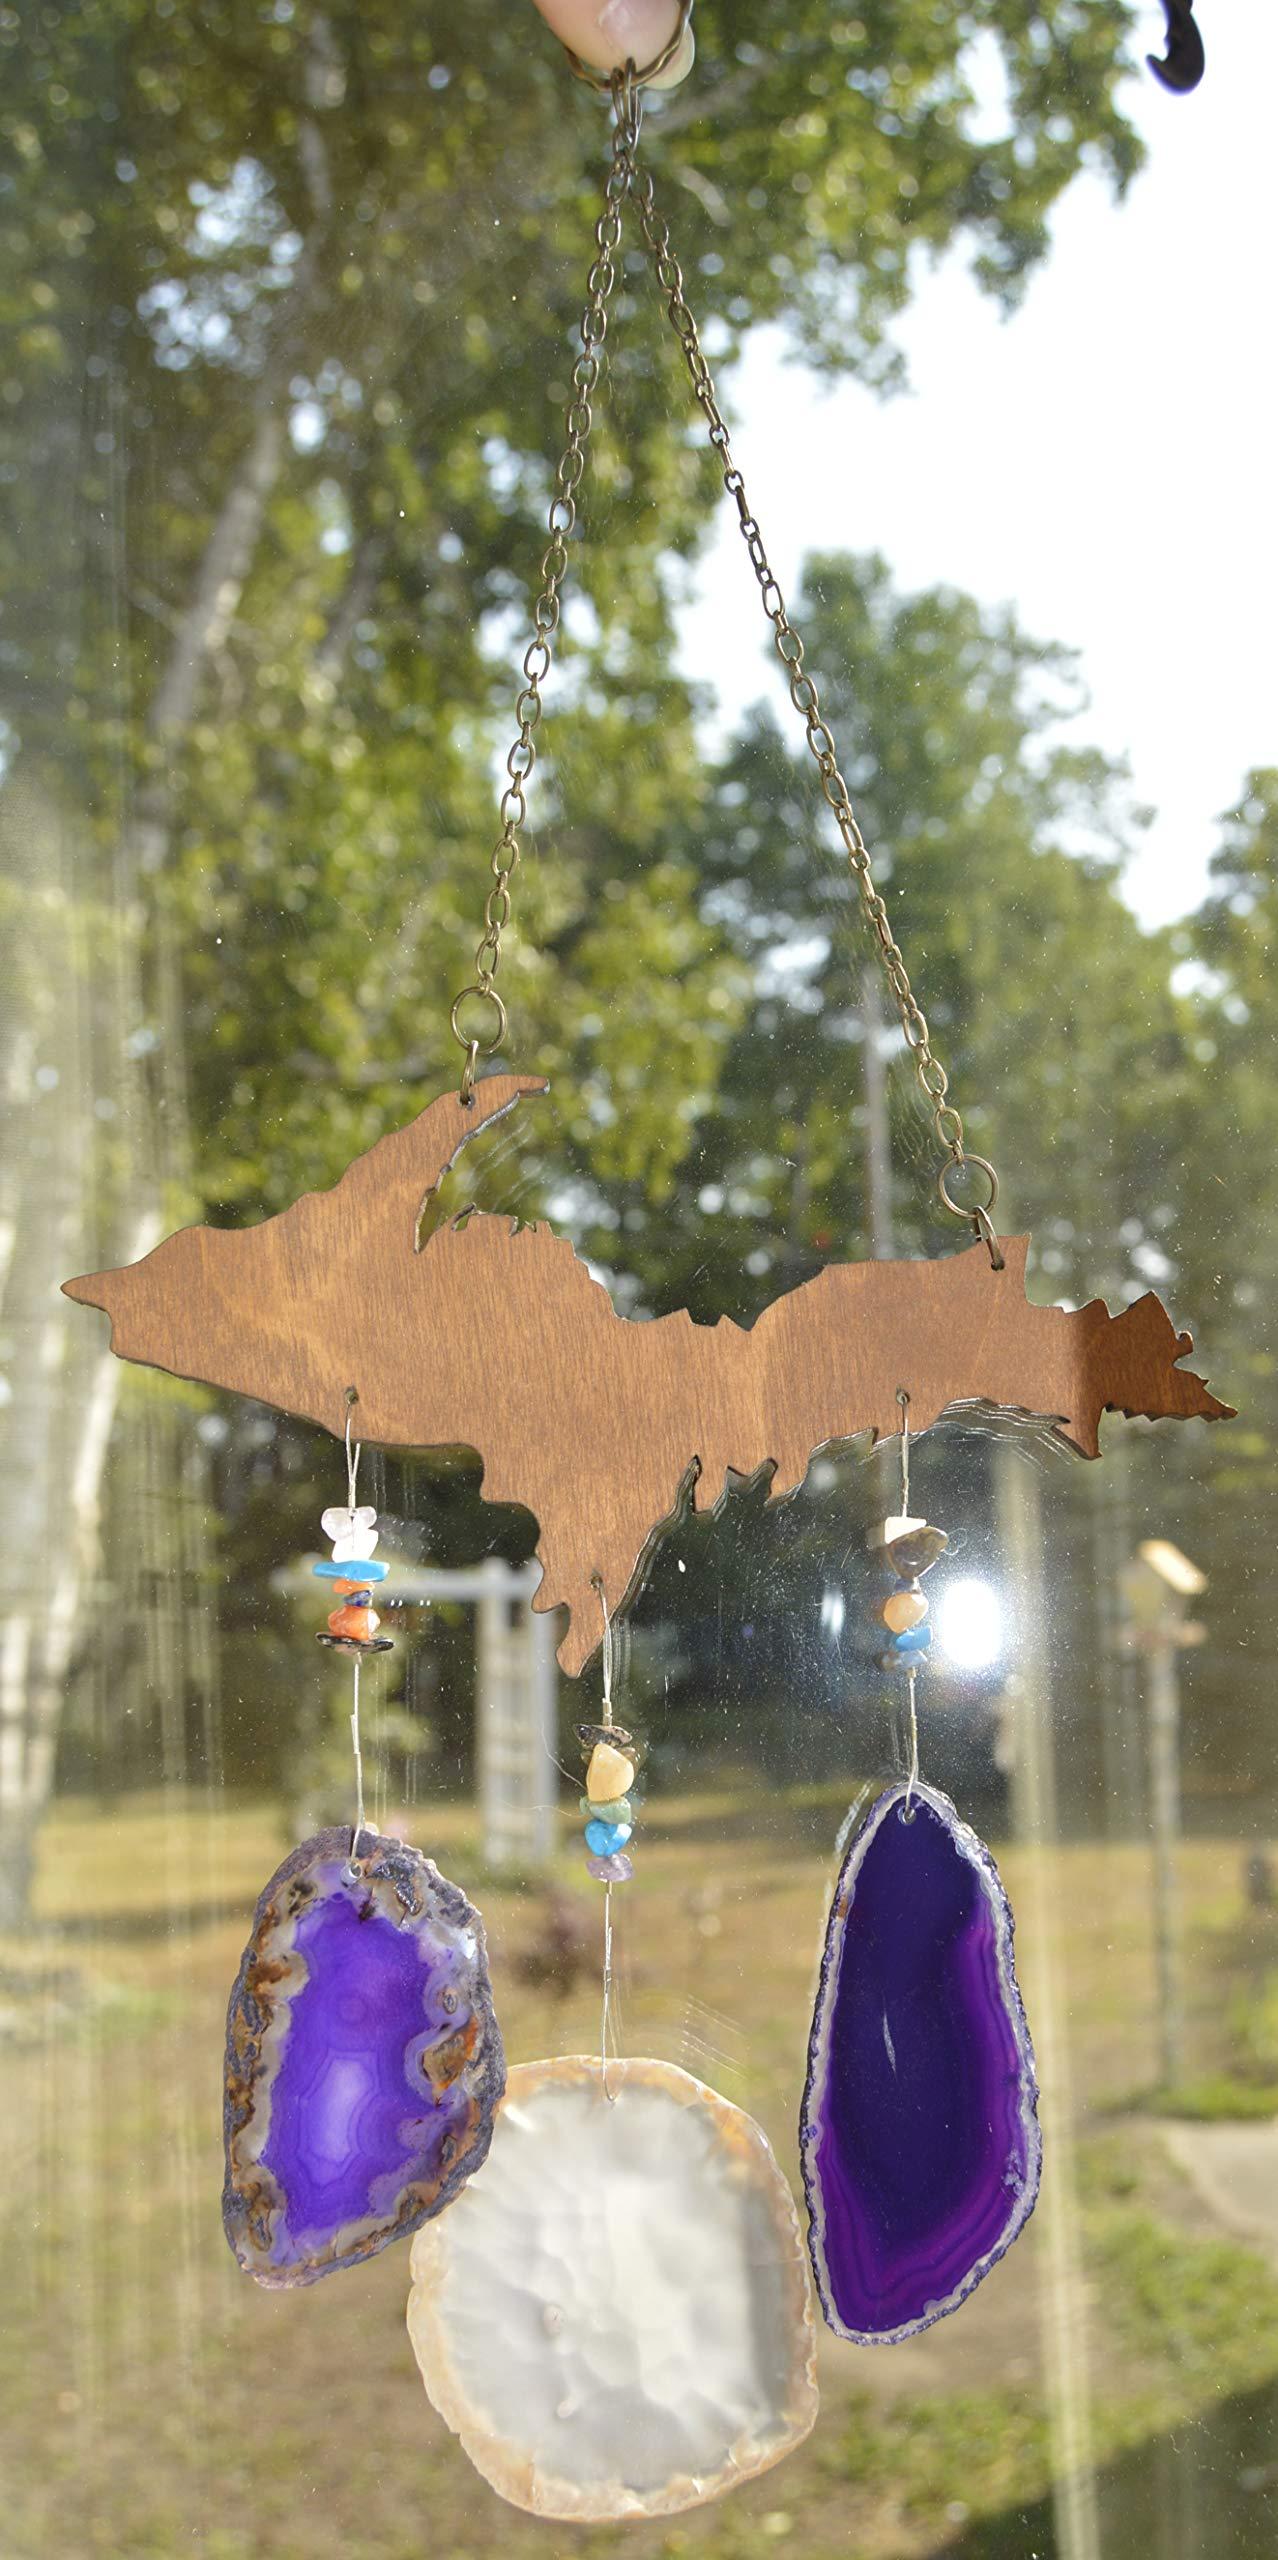 wind chime Purple and cream Agate slice geode windchime Michigan Upper peninsula U P wood stone sun catcher wind chime mobile window decor hanging